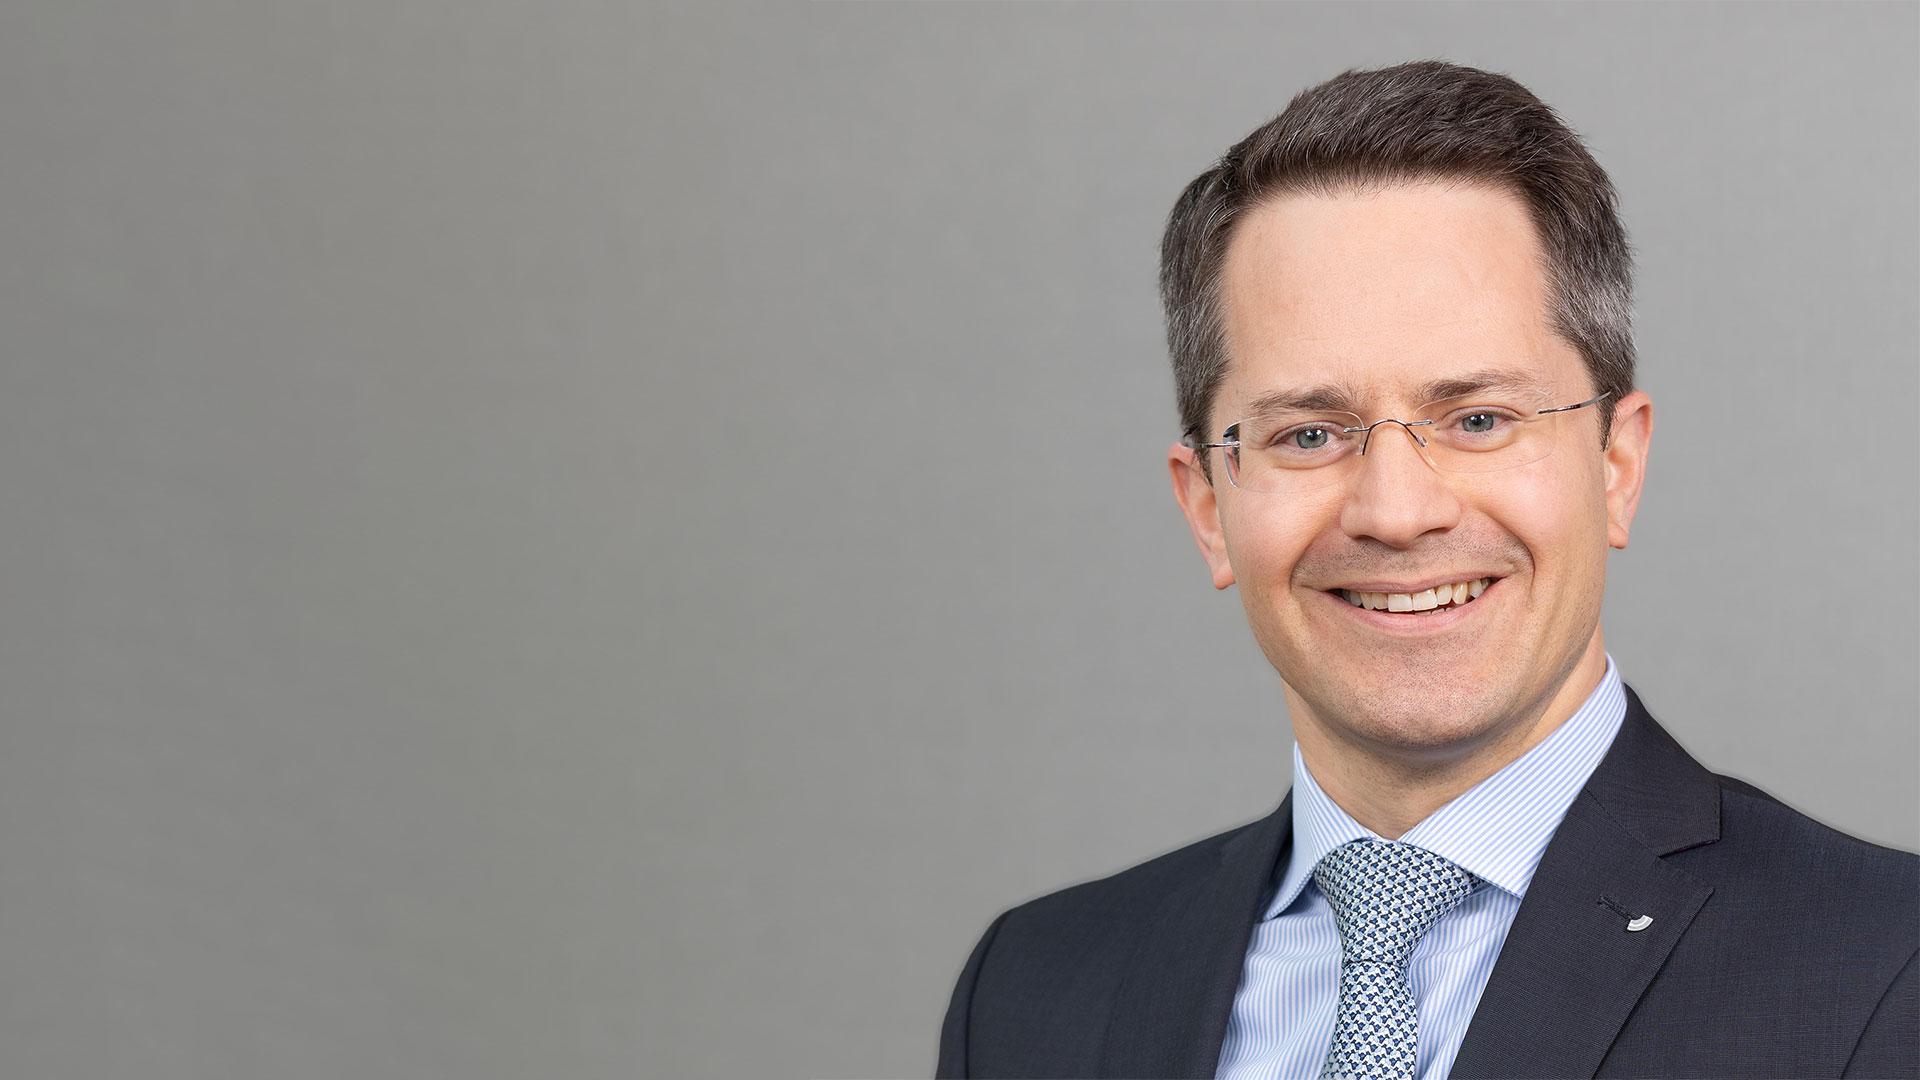 Axel Rainer Hoffmann